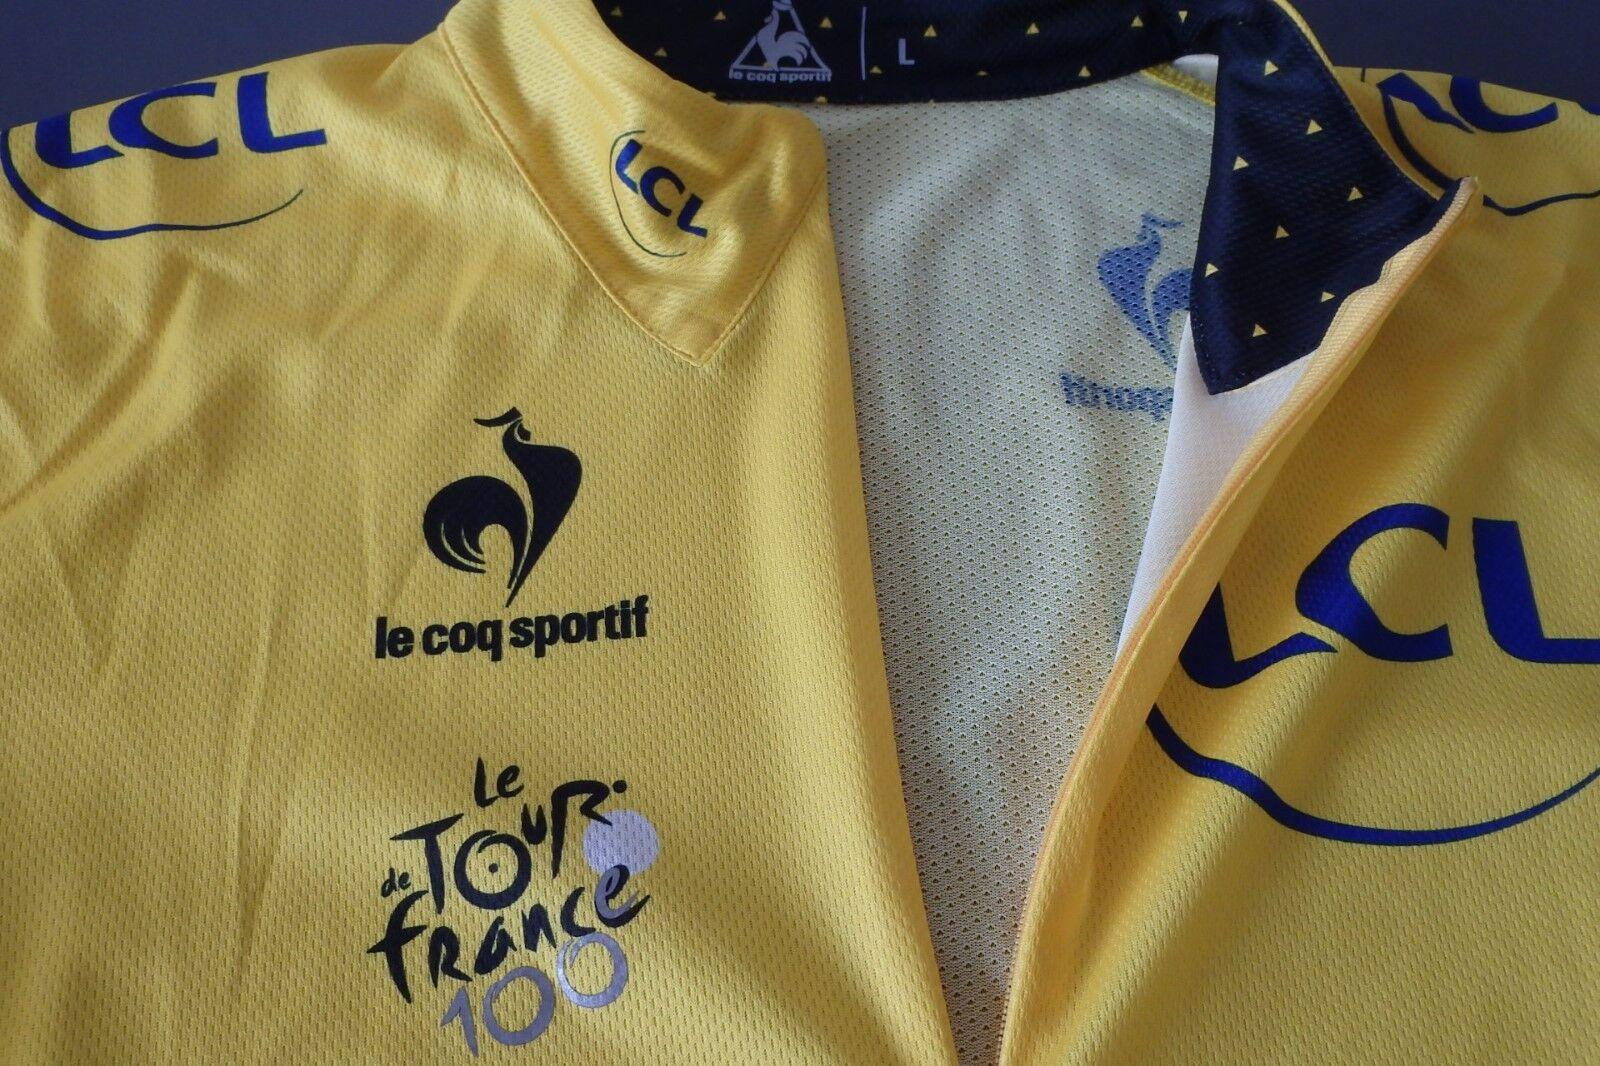 Le Coq Sportif 100th  Tour de France comemorative yellow jersey  save up to 80%